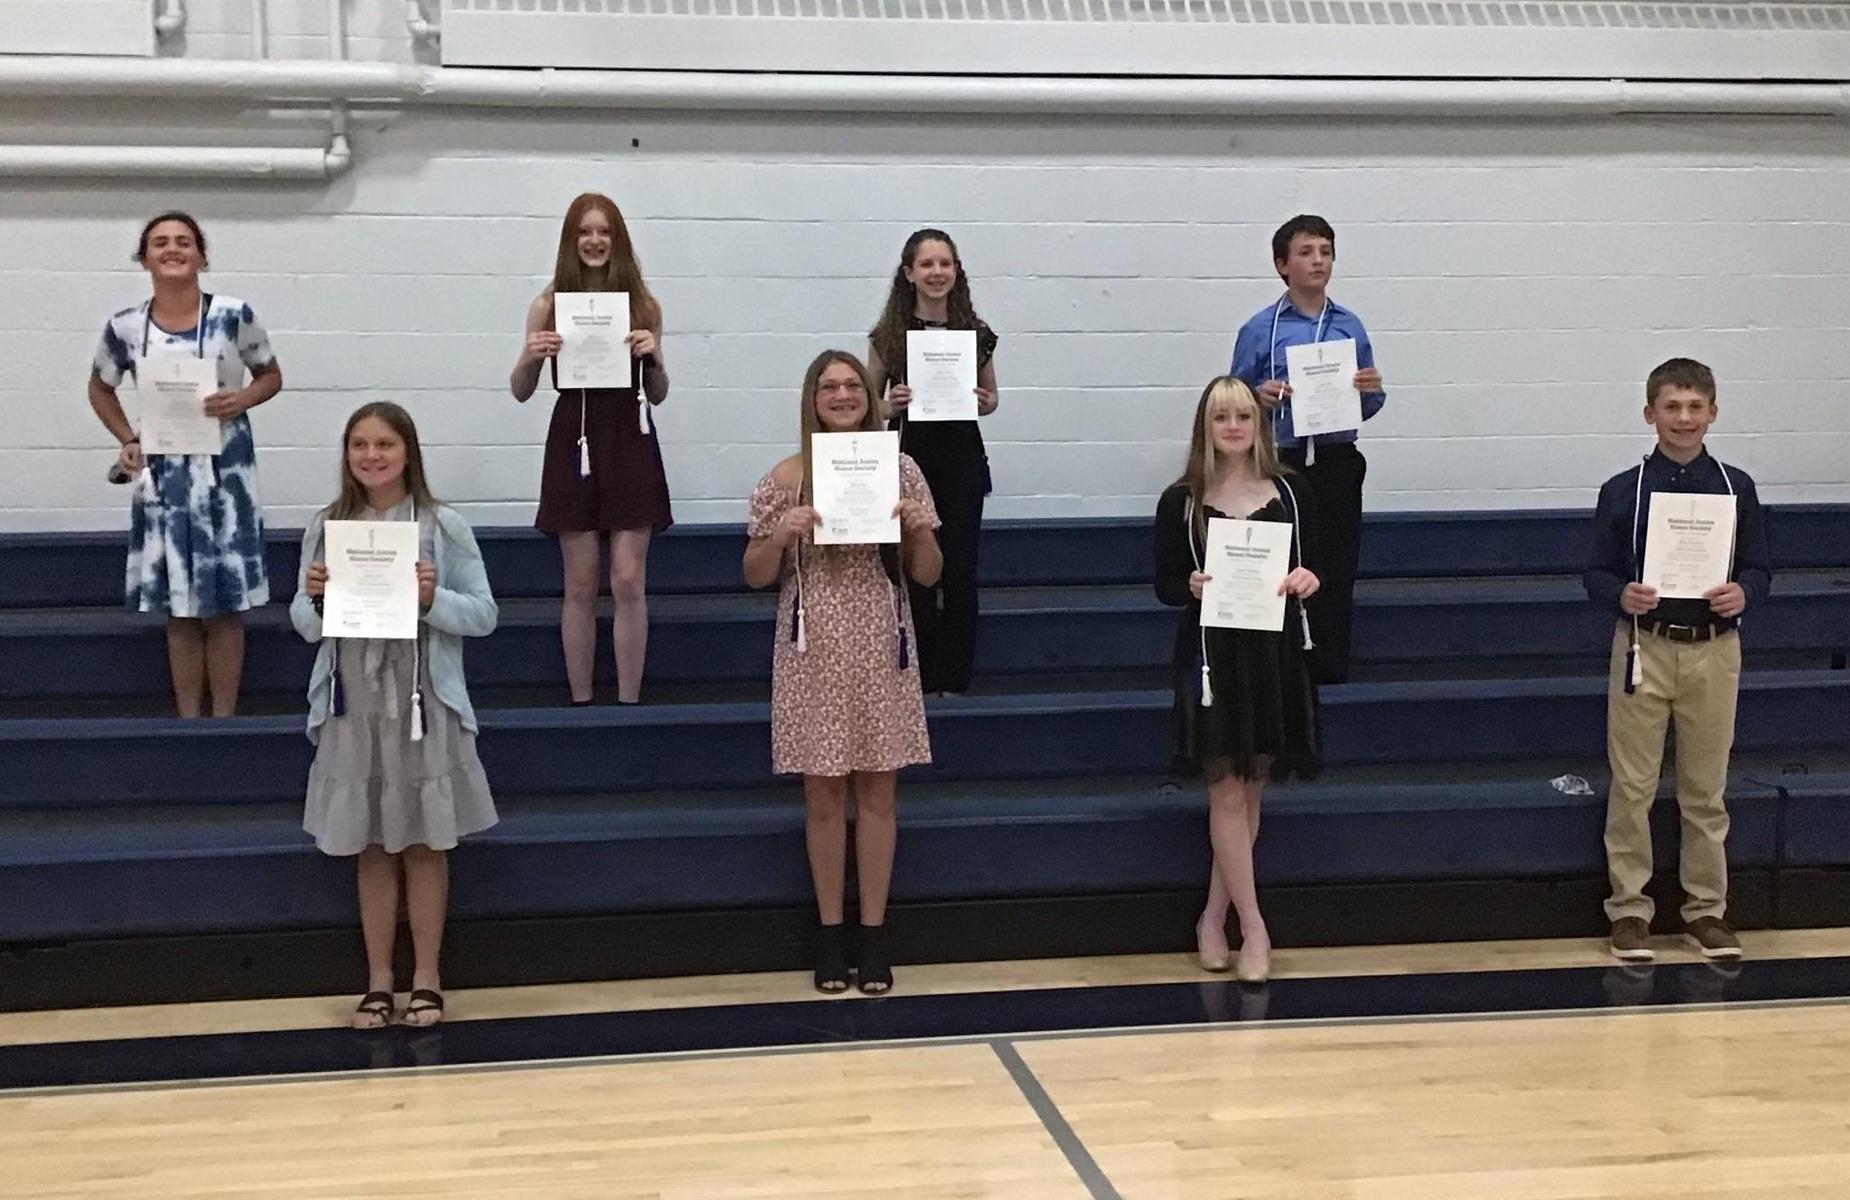 National Junior Honor Society Ceremony